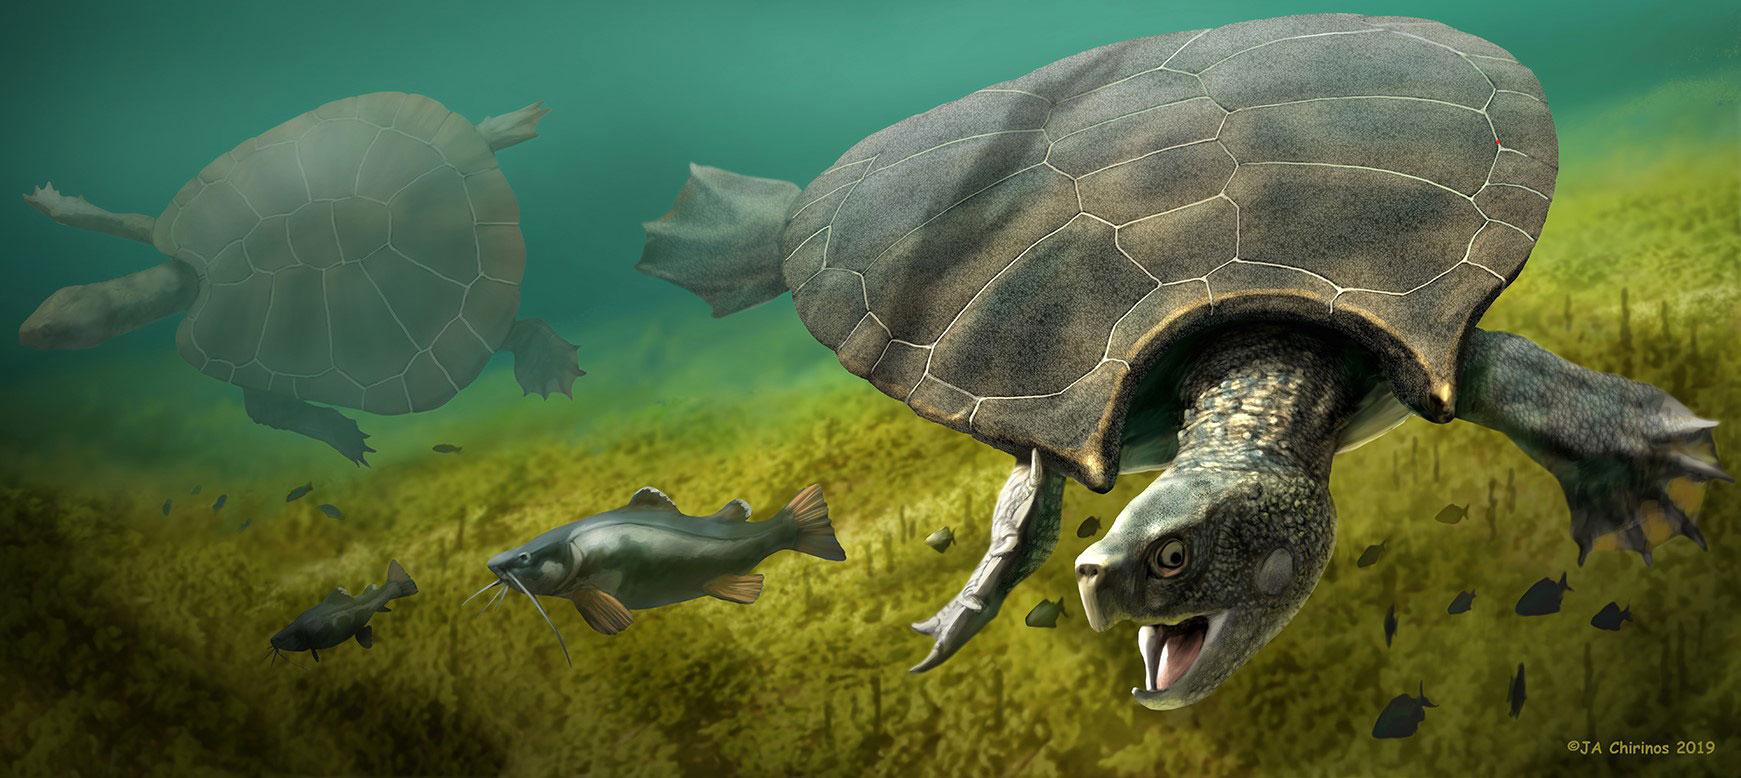 Scientists dug up car-sized turtle fossil - Tech Explorist